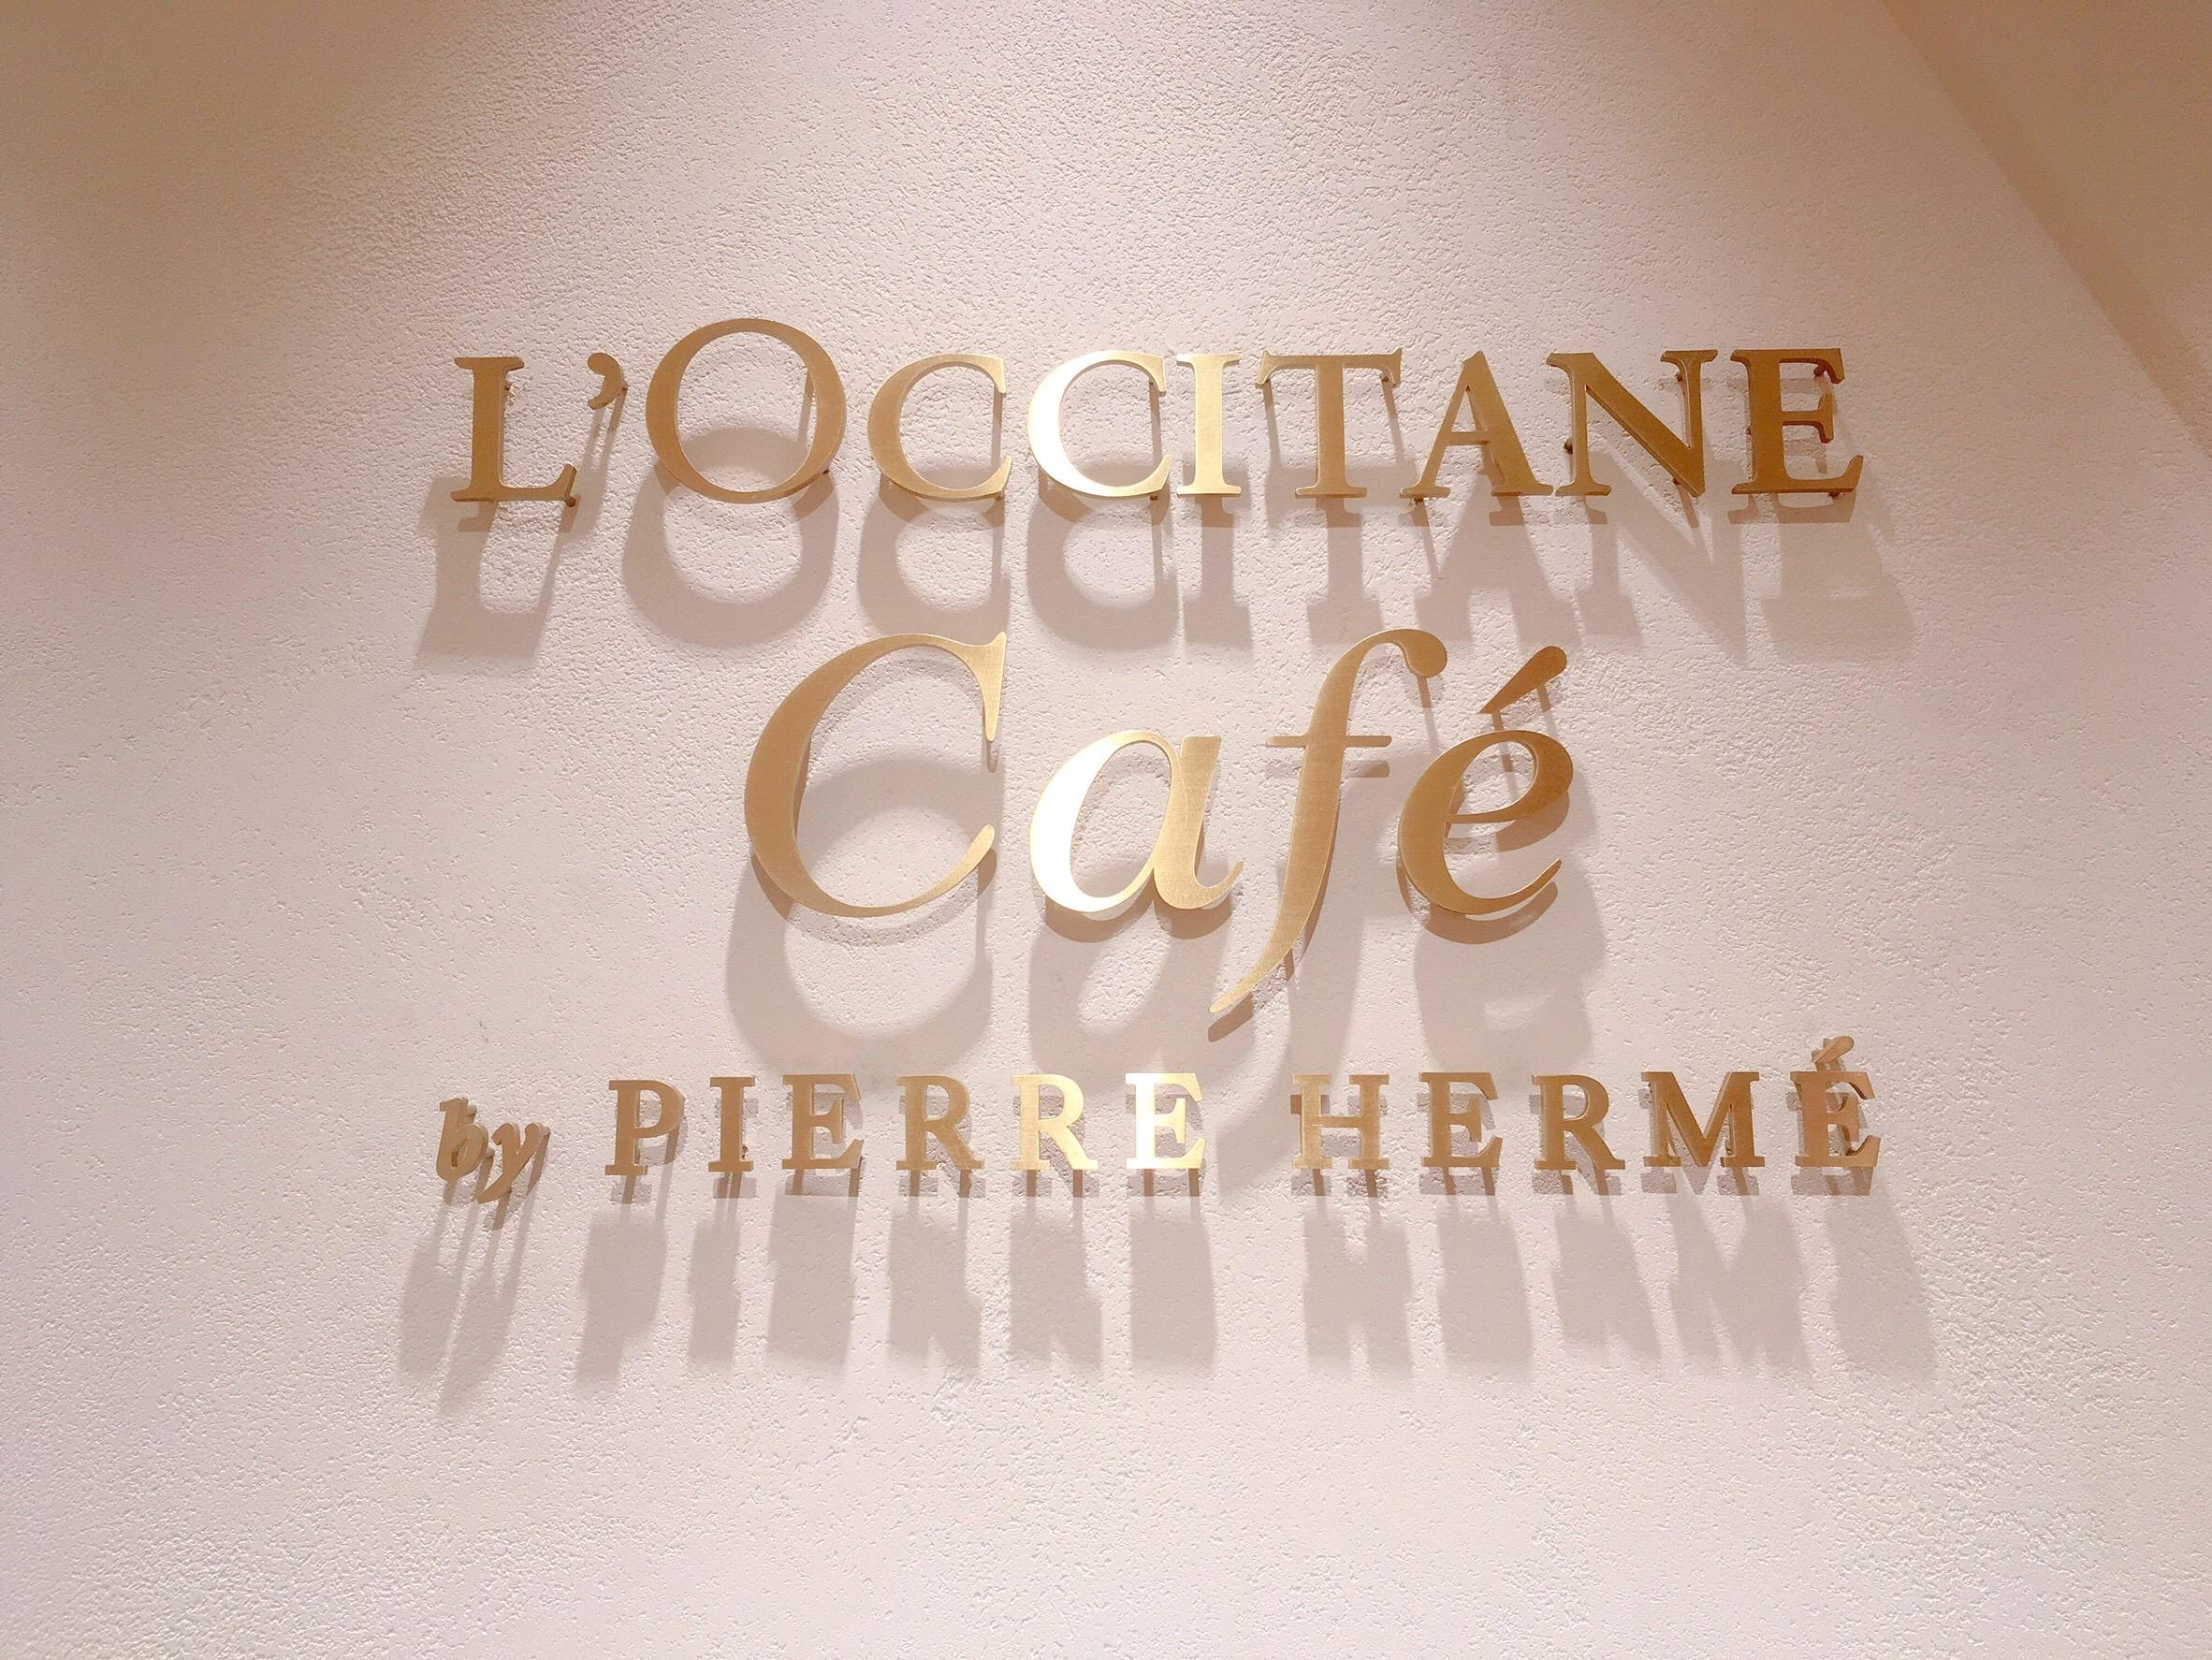 L'OCCITANE Café by Pierre Hermé